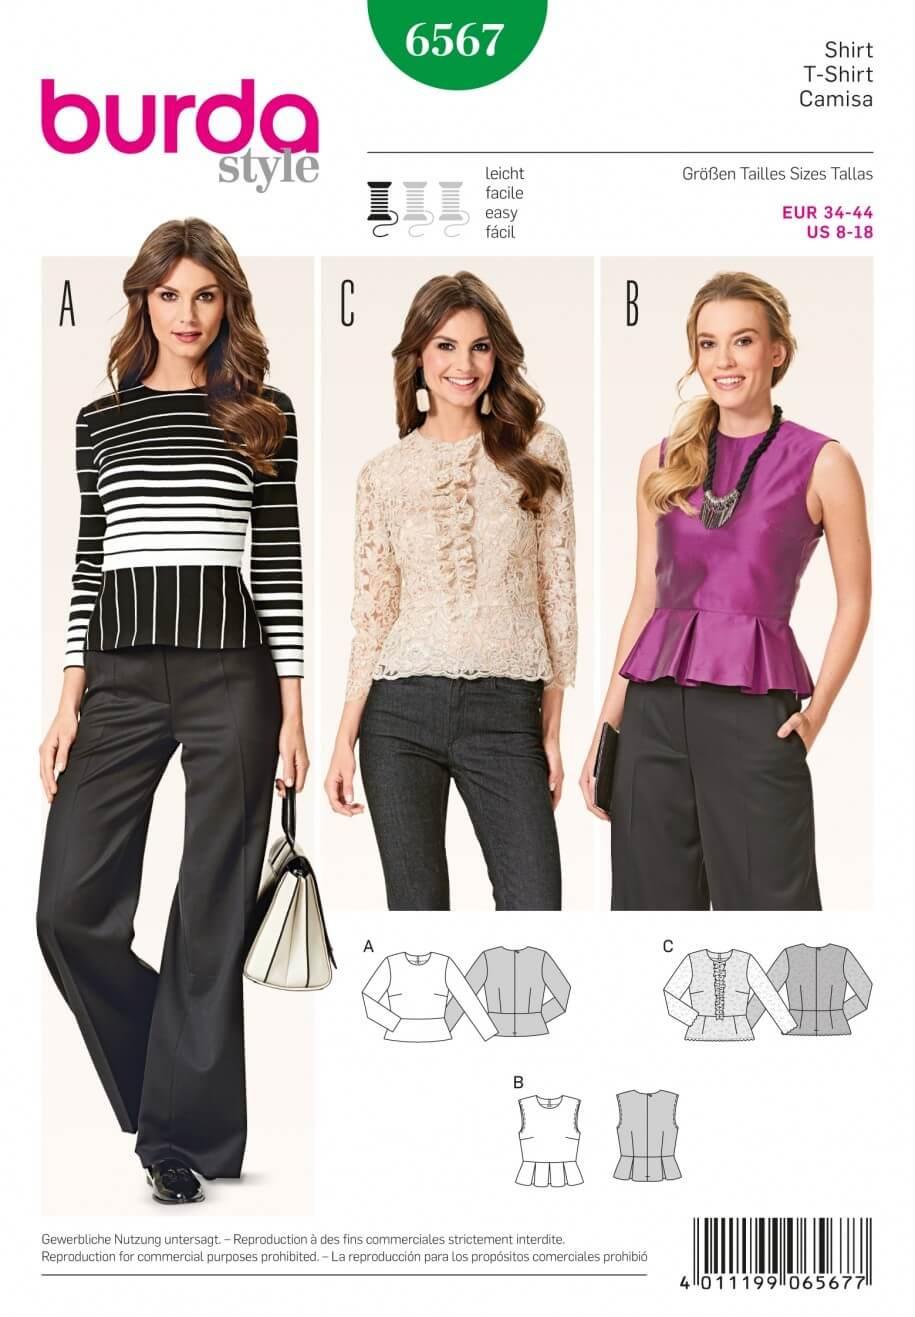 Burda Misses Peplum Hem Tops Shirts and Blouses Sewing Pattern 6567